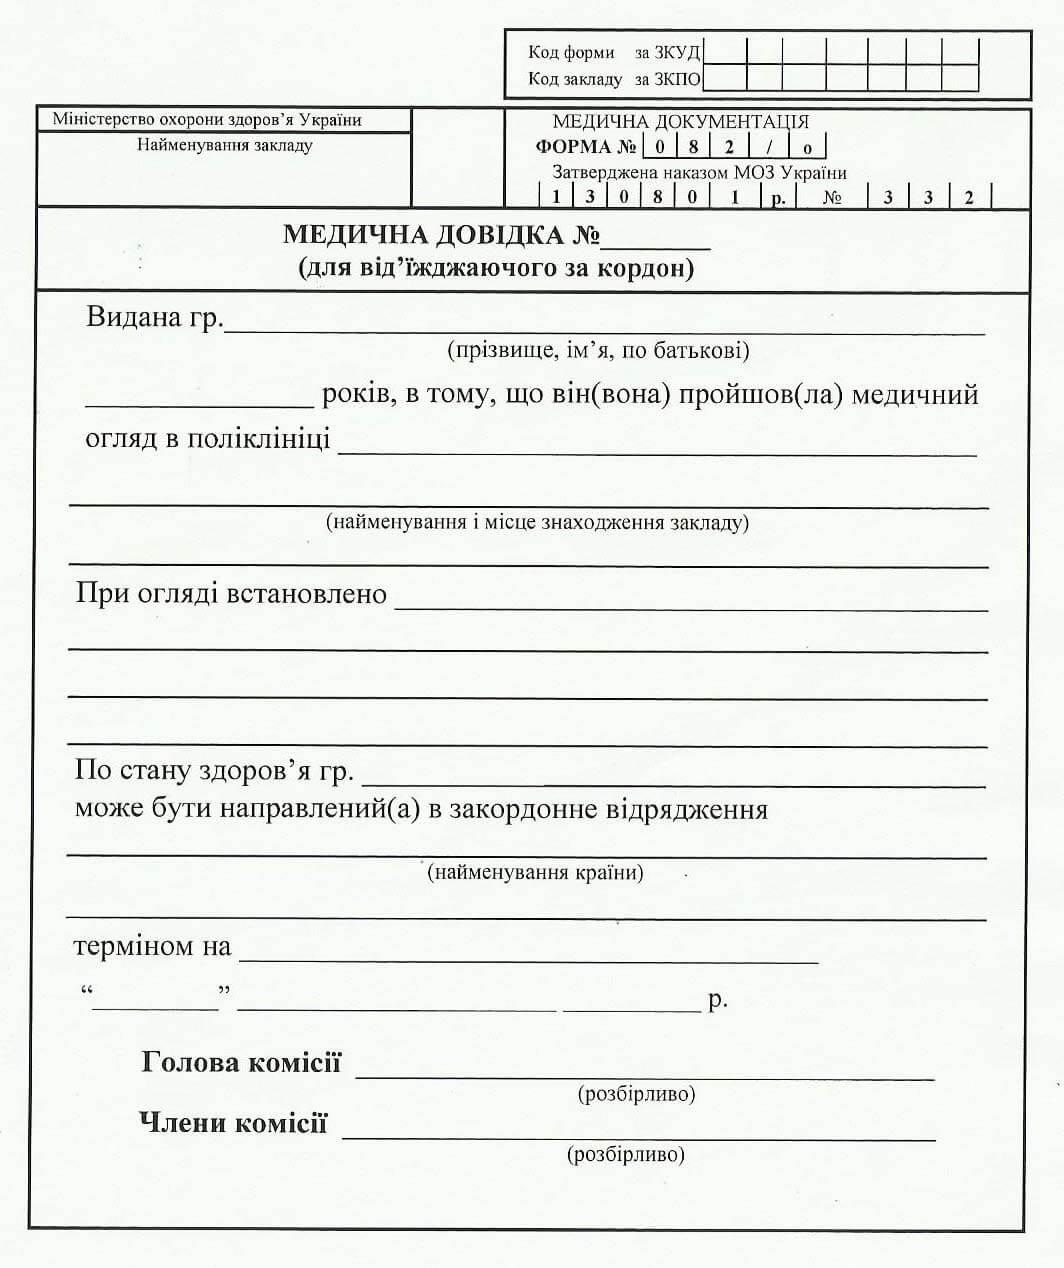 детская комиссия бланк 086